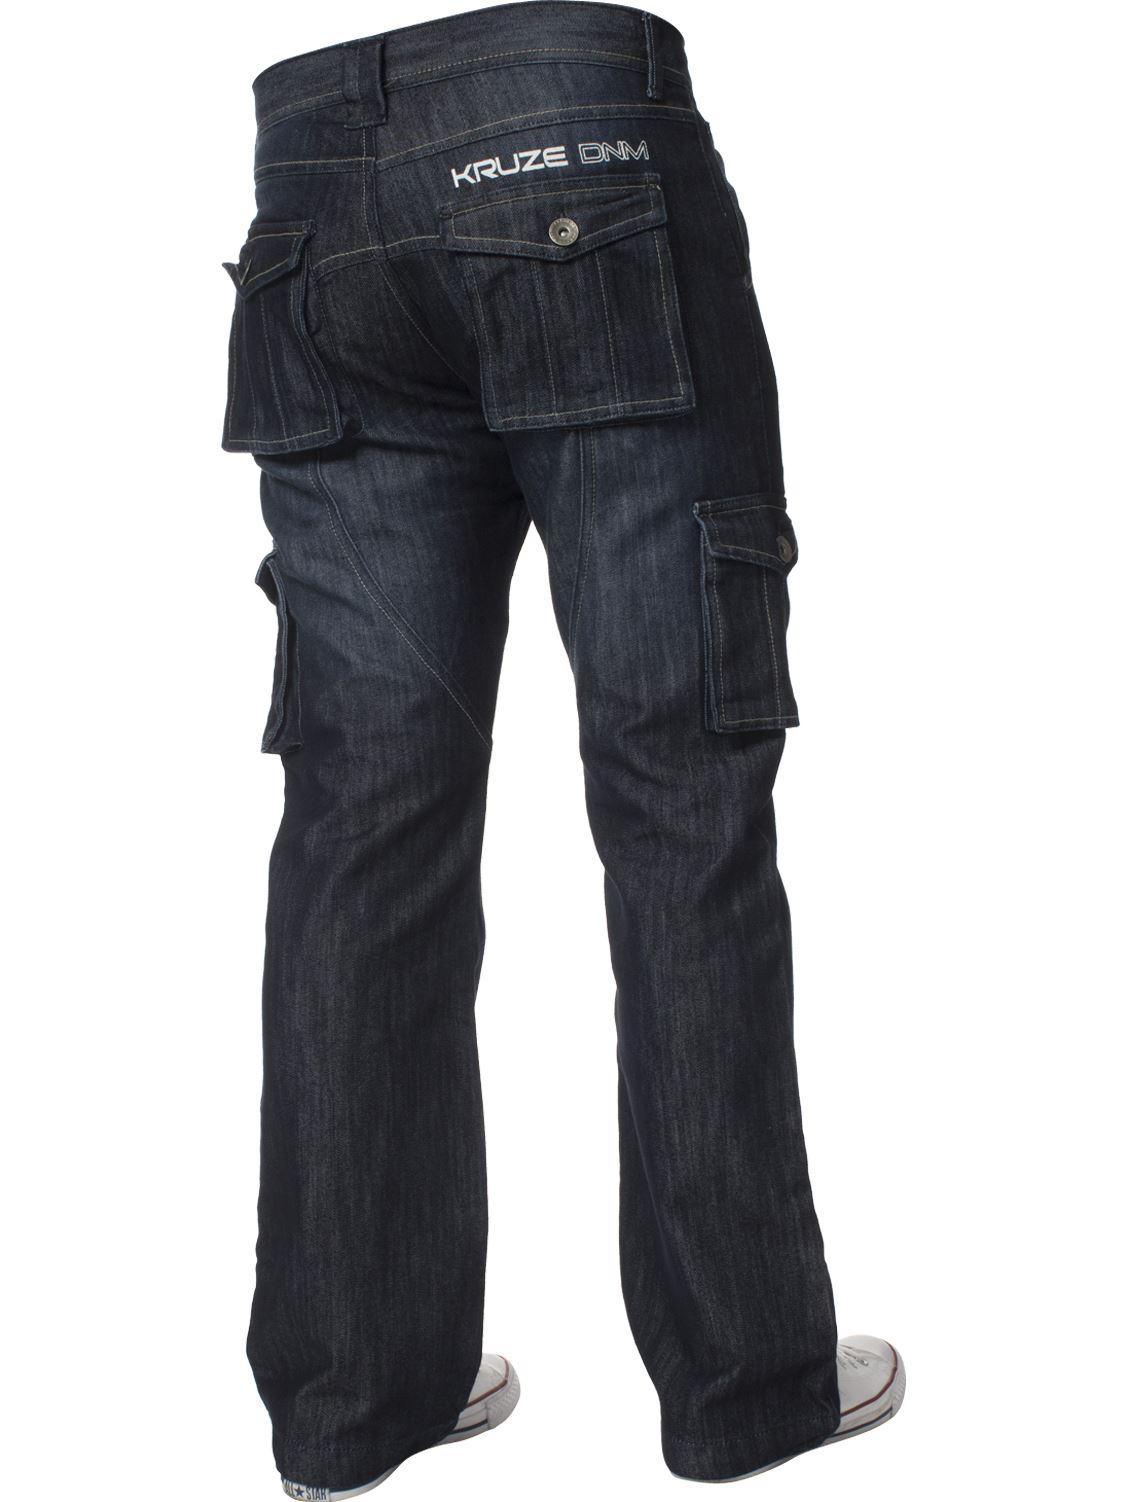 Grandes-jeans-para-hombre-de-combate-de-Kruze-Rey-Alto-Pierna-Cargo-Pantalones-Jeans-Pantalones miniatura 15